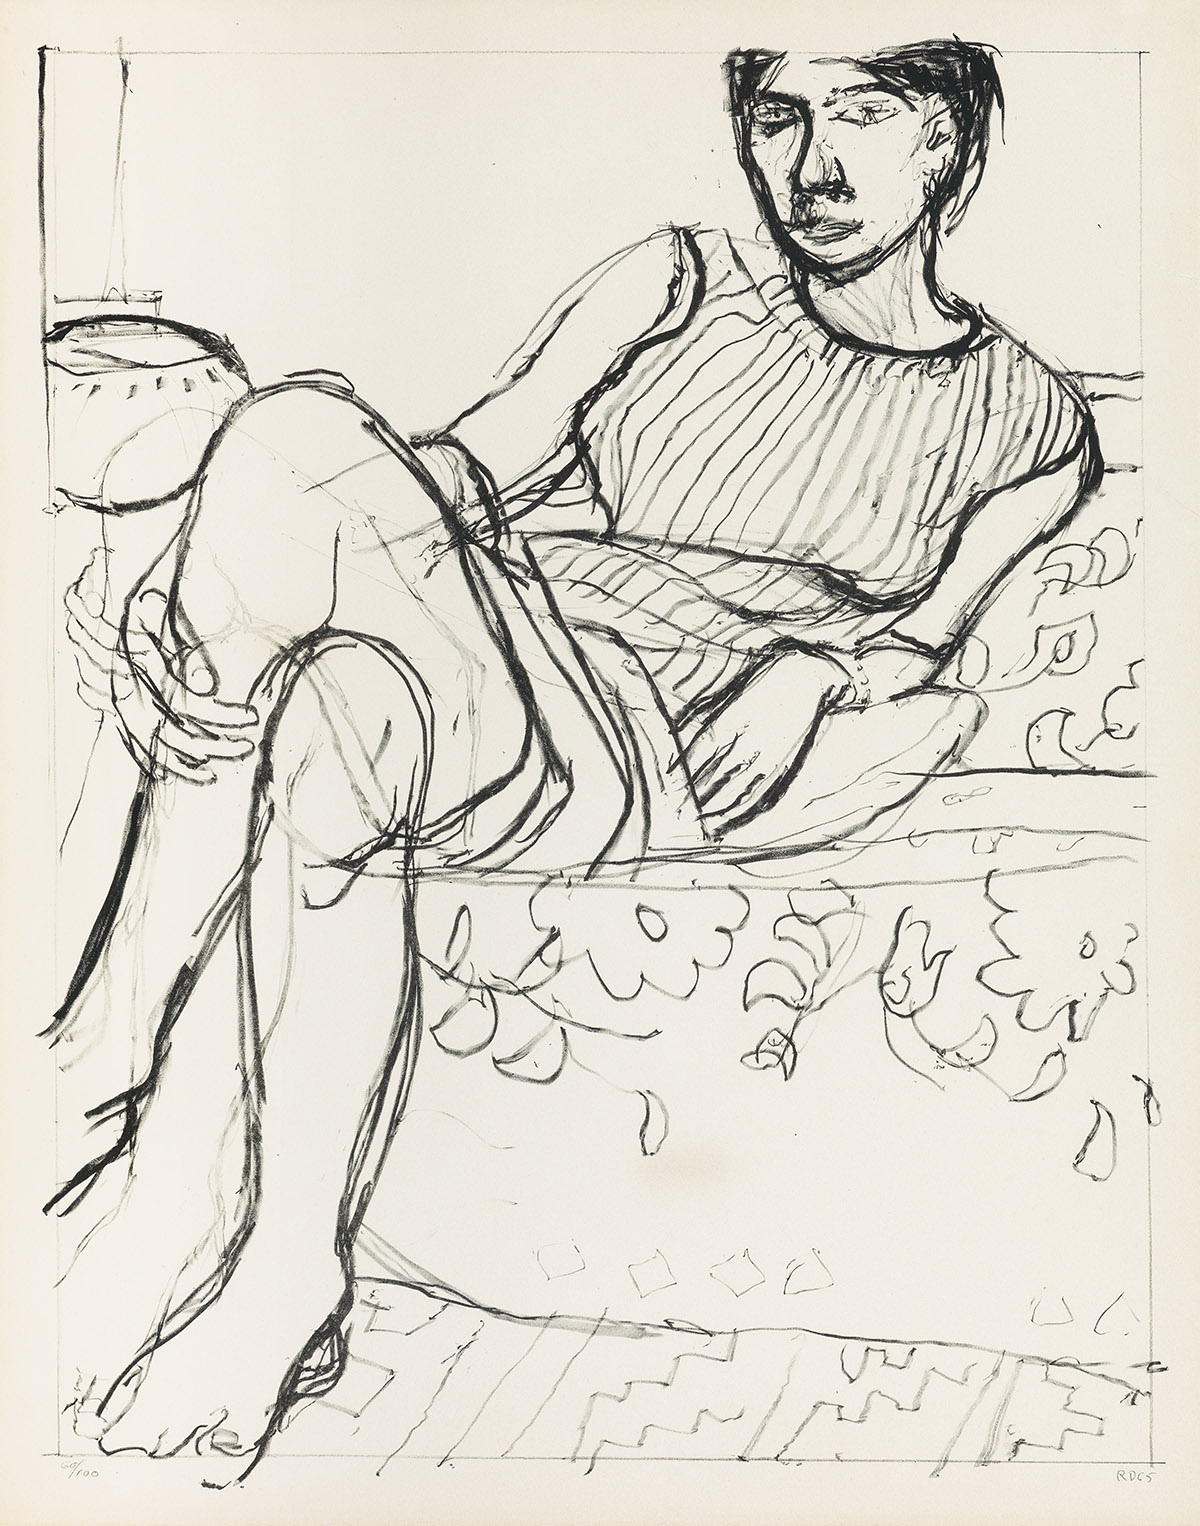 RICHARD-DIEBENKORN-Seated-Woman-in-a-Striped-Dress